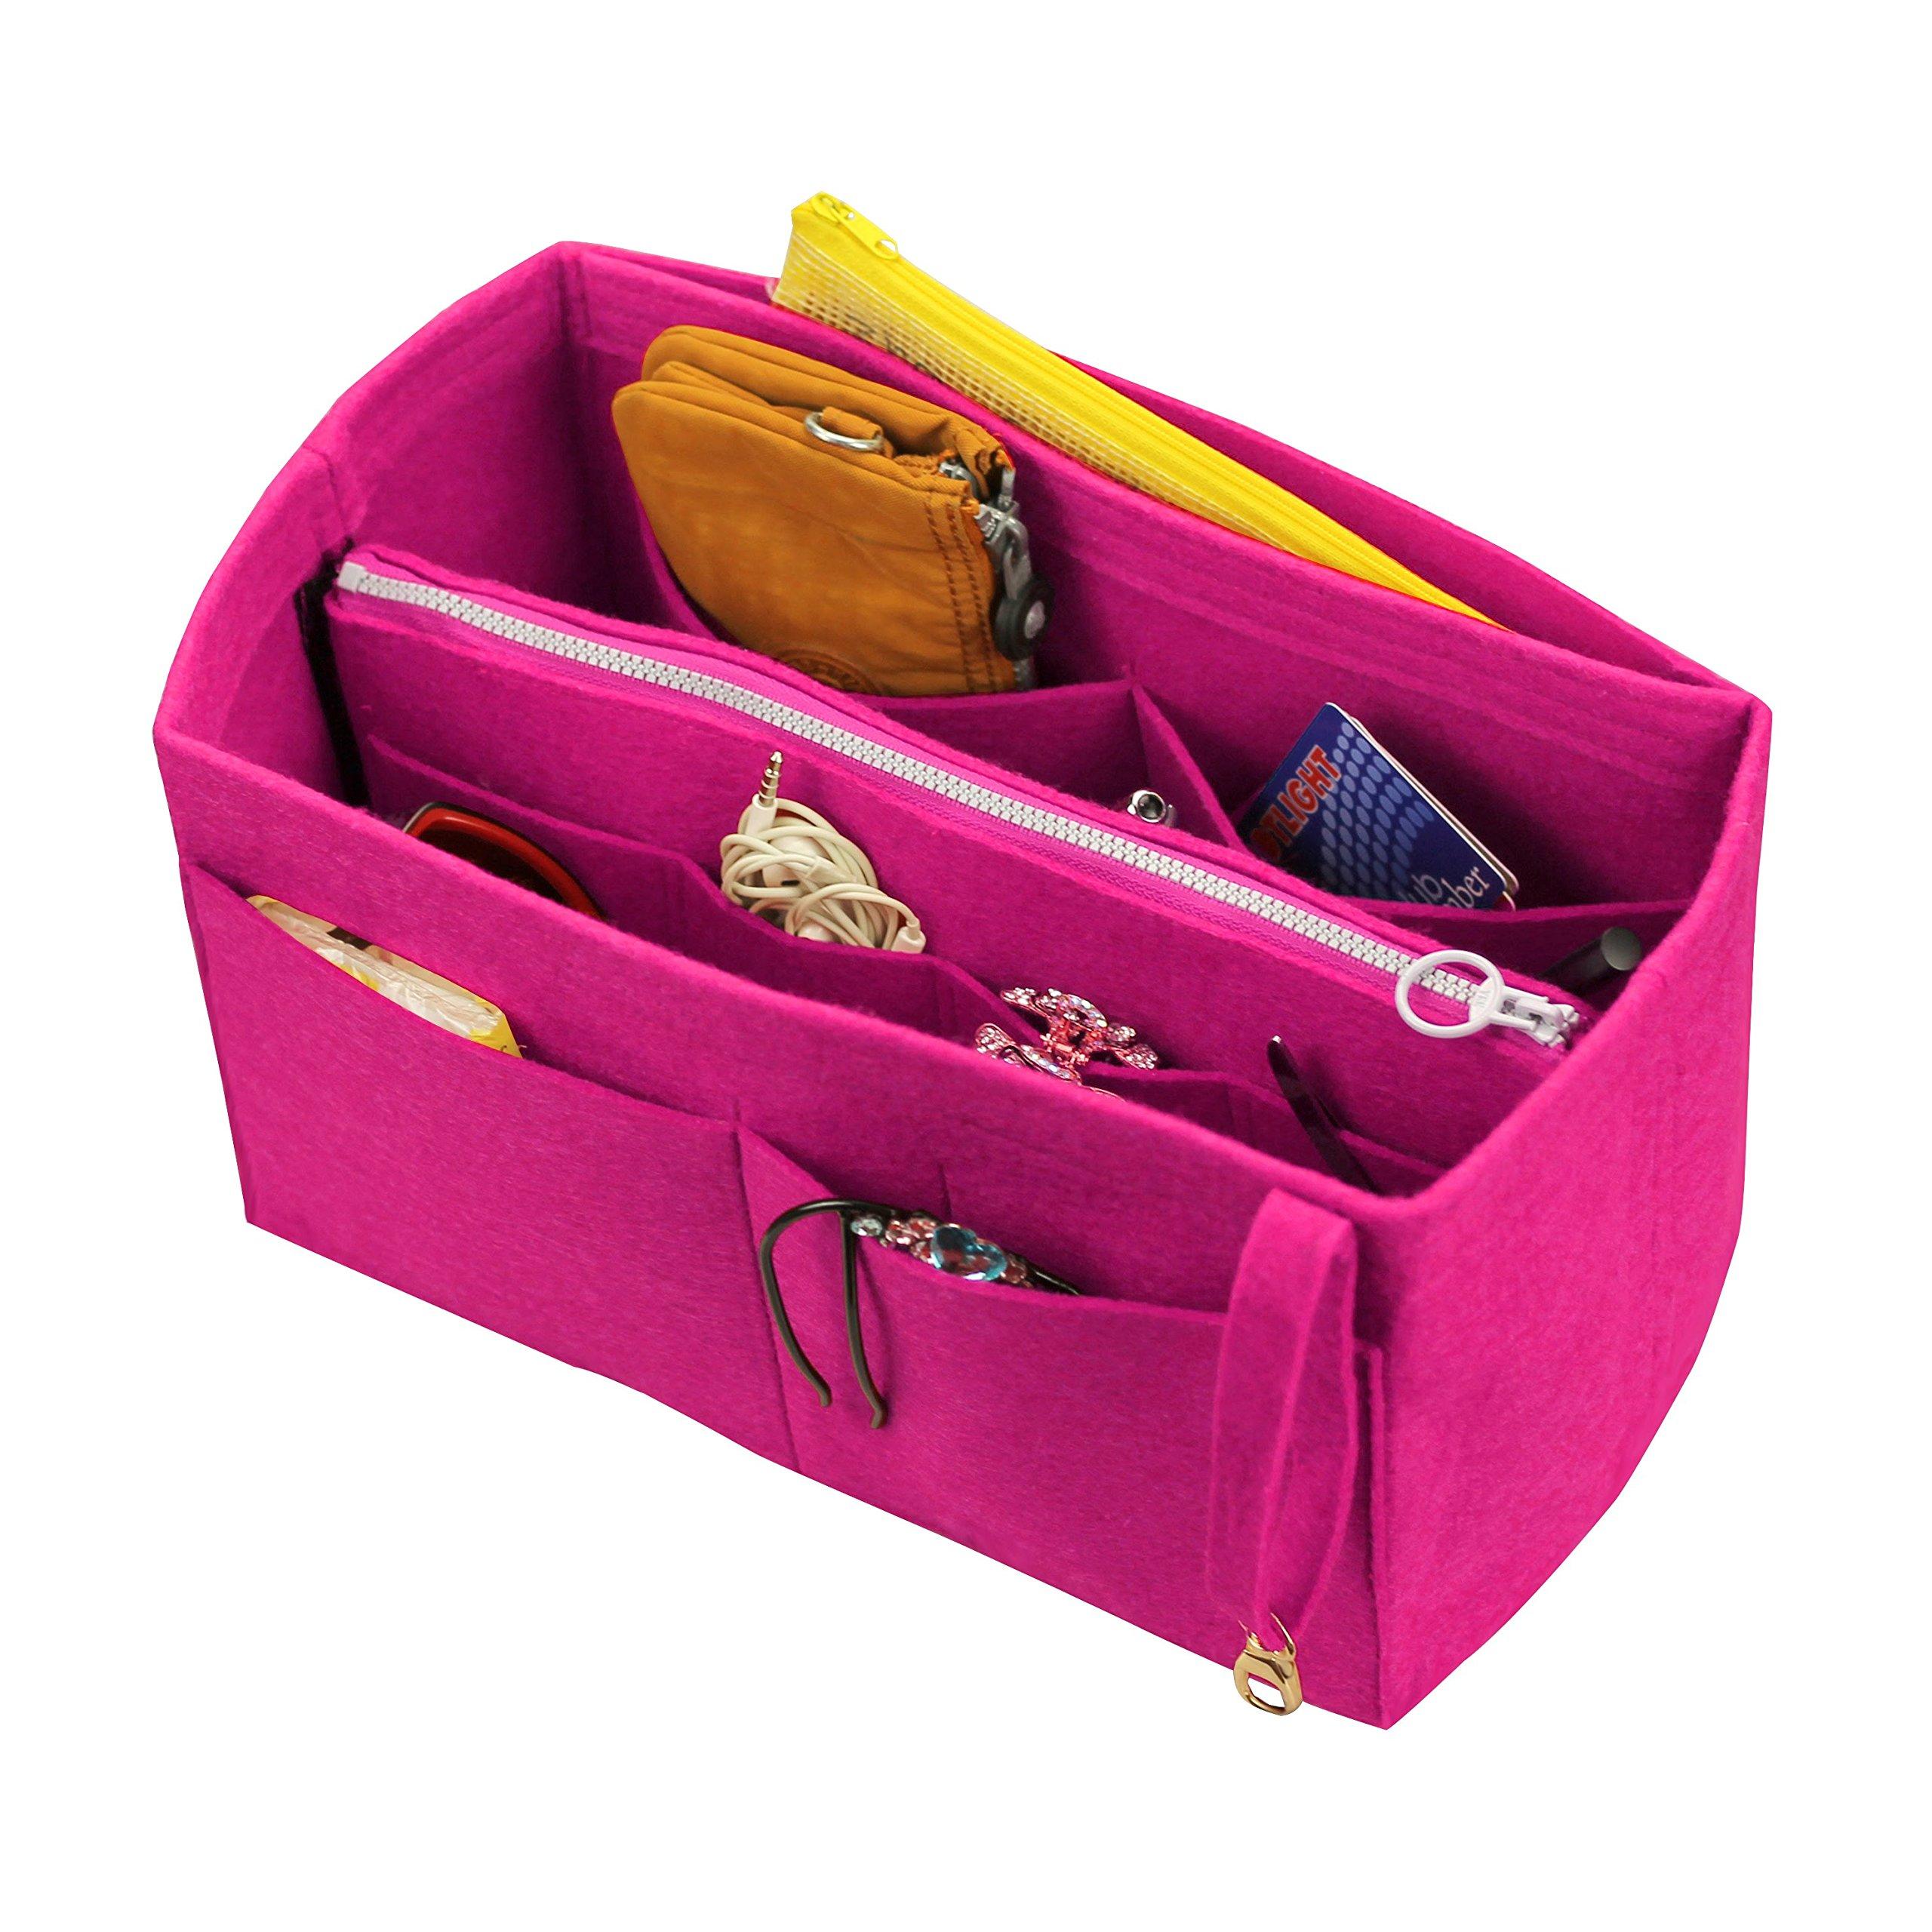 [Fits Various Bags, L.V Her.mes Long.champ Go.yard] Felt Tote Organizer (w/ Detachable Zipper Bag), Purse Insert, Cosmetic Makeup Diaper Handbag, Belongings Pocket